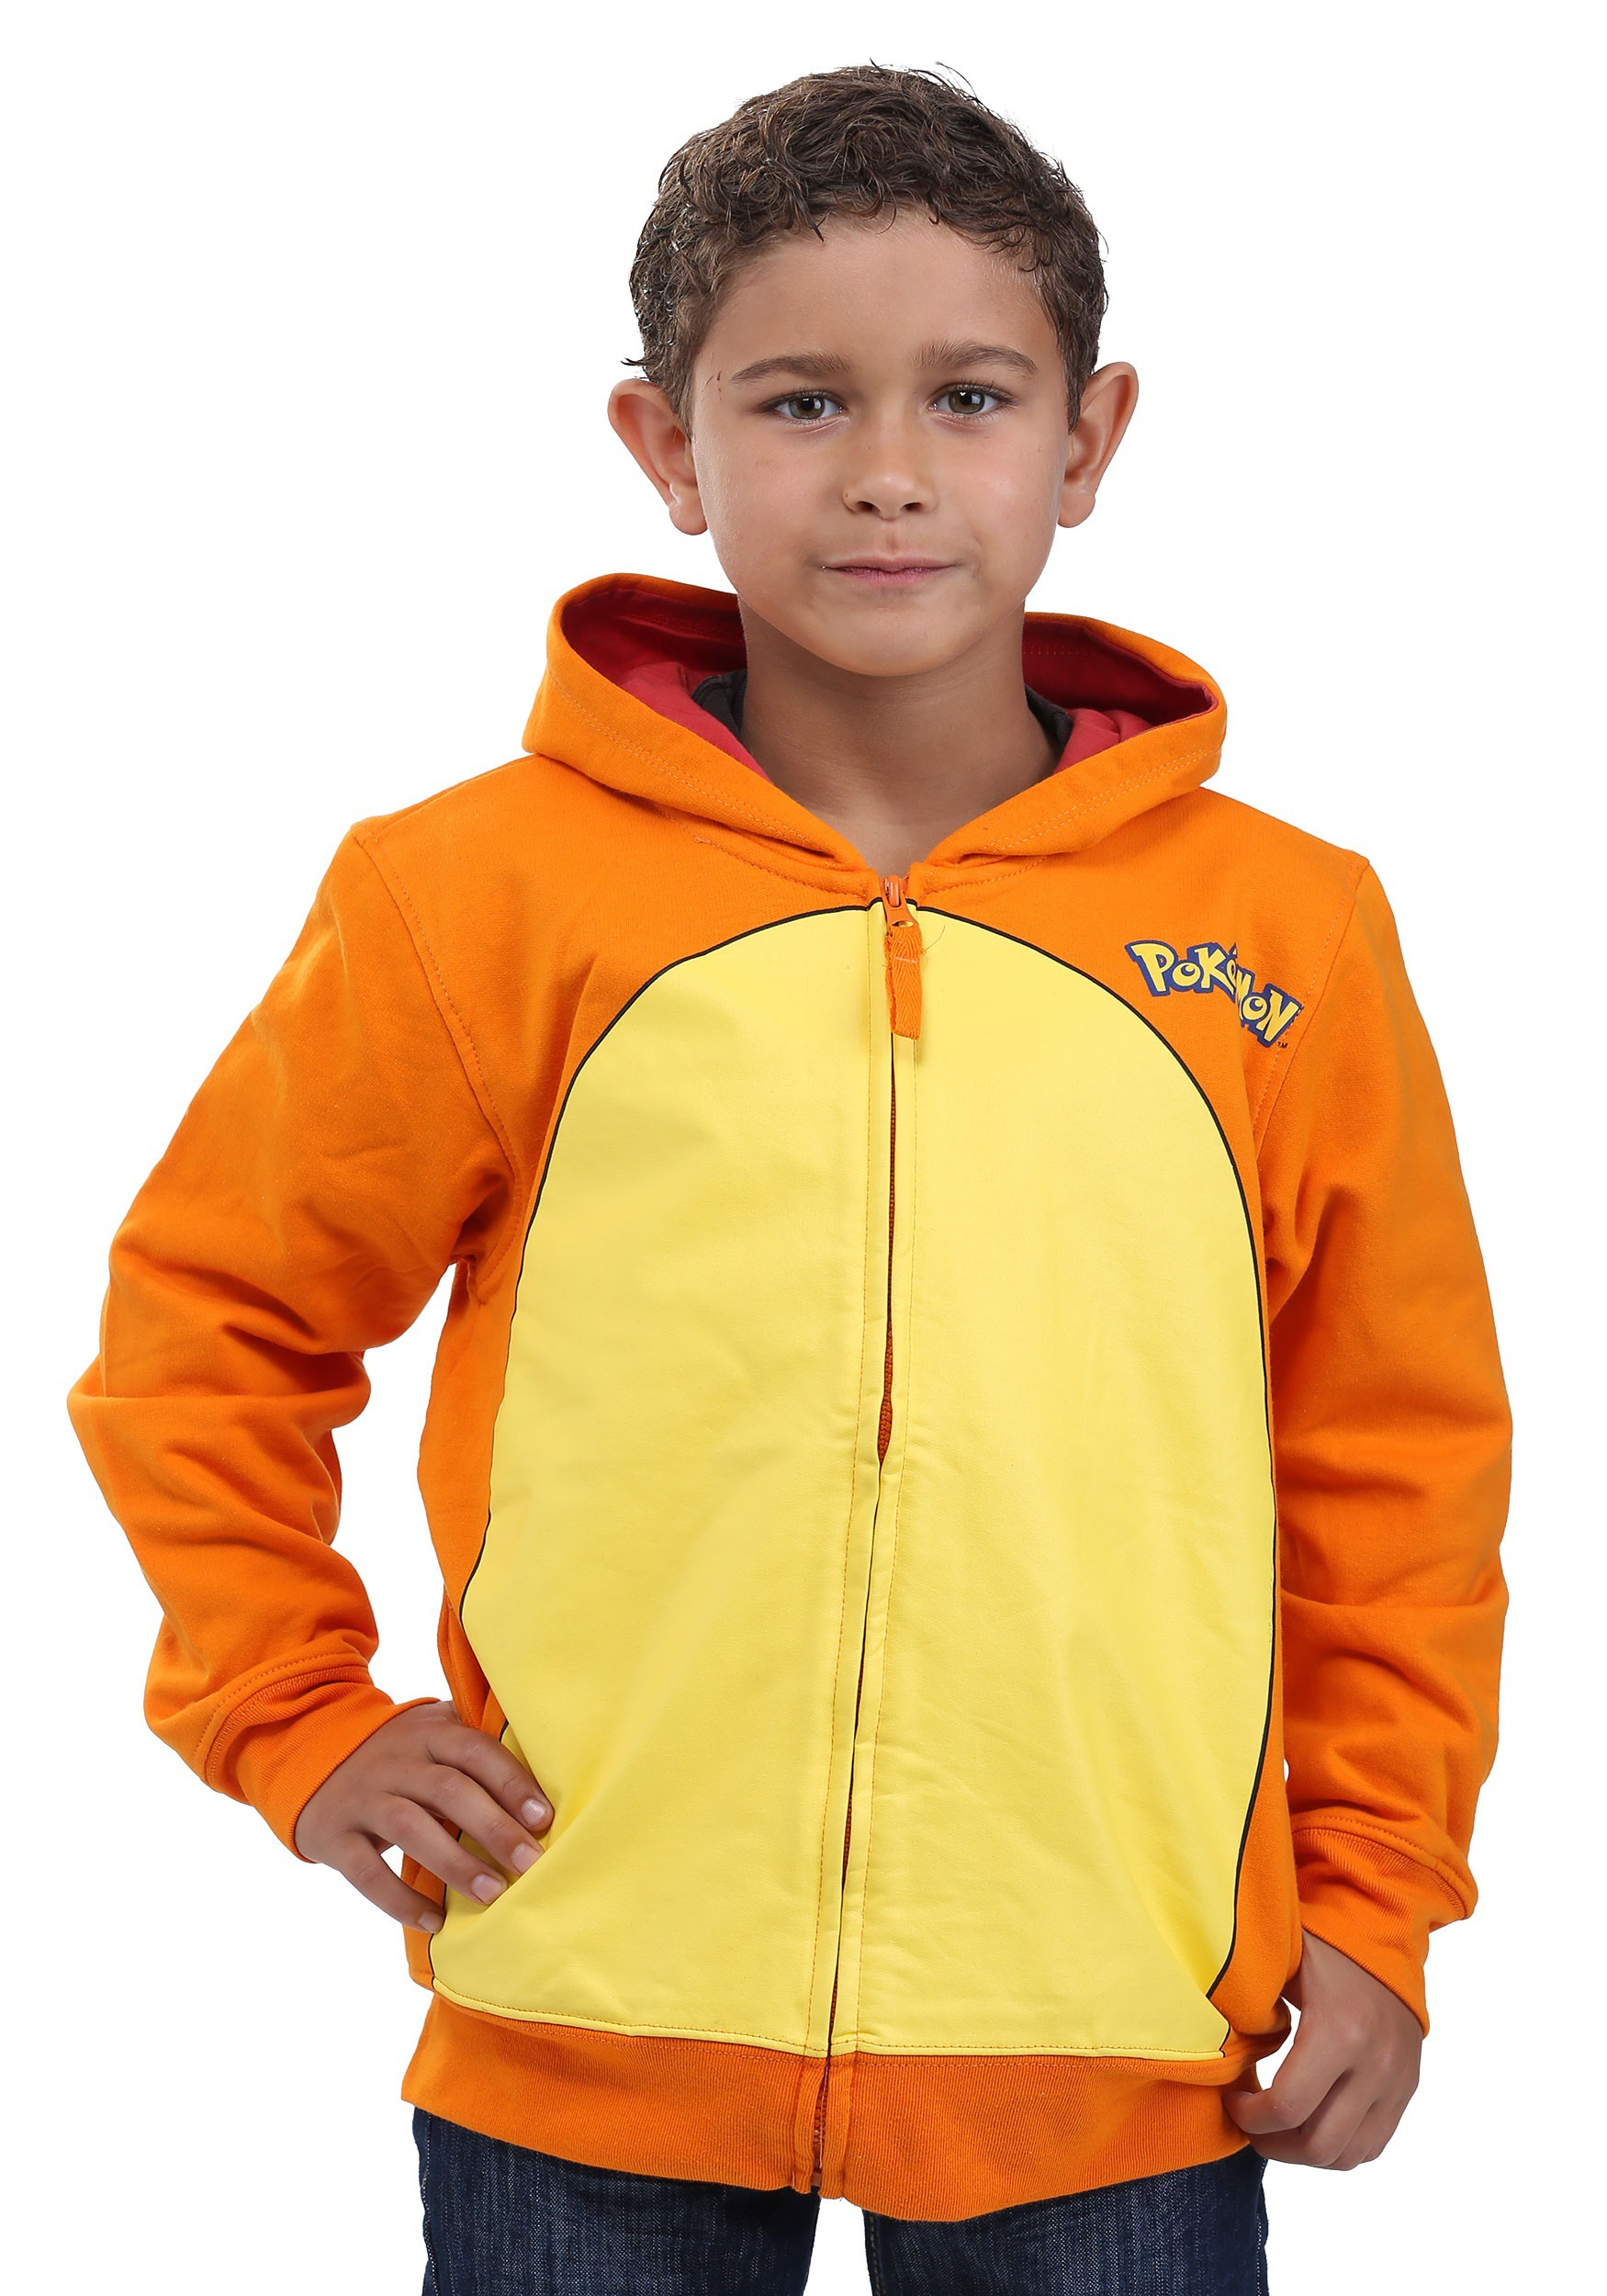 e23de63c1e92 Pokemon Charmander Costume Hoodie for Kids